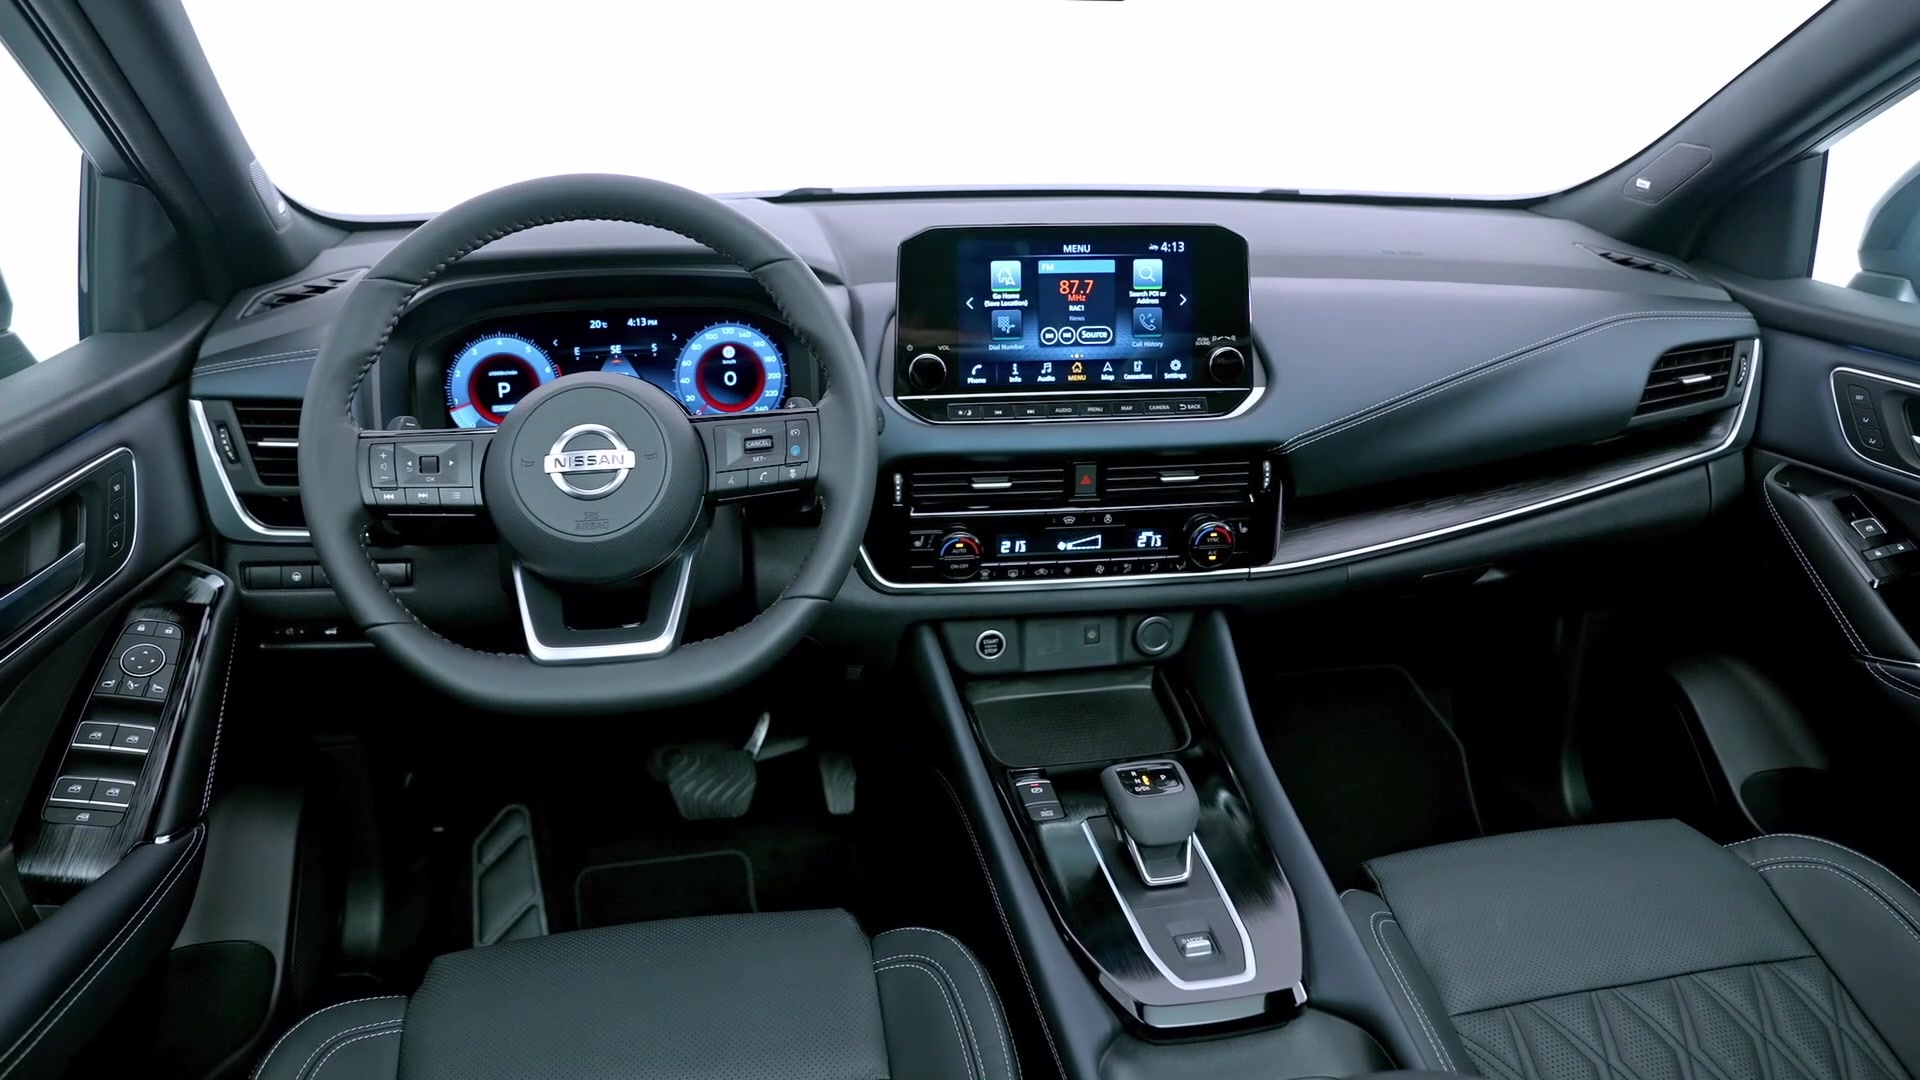 2021 Nissan Qashqai Interior Design